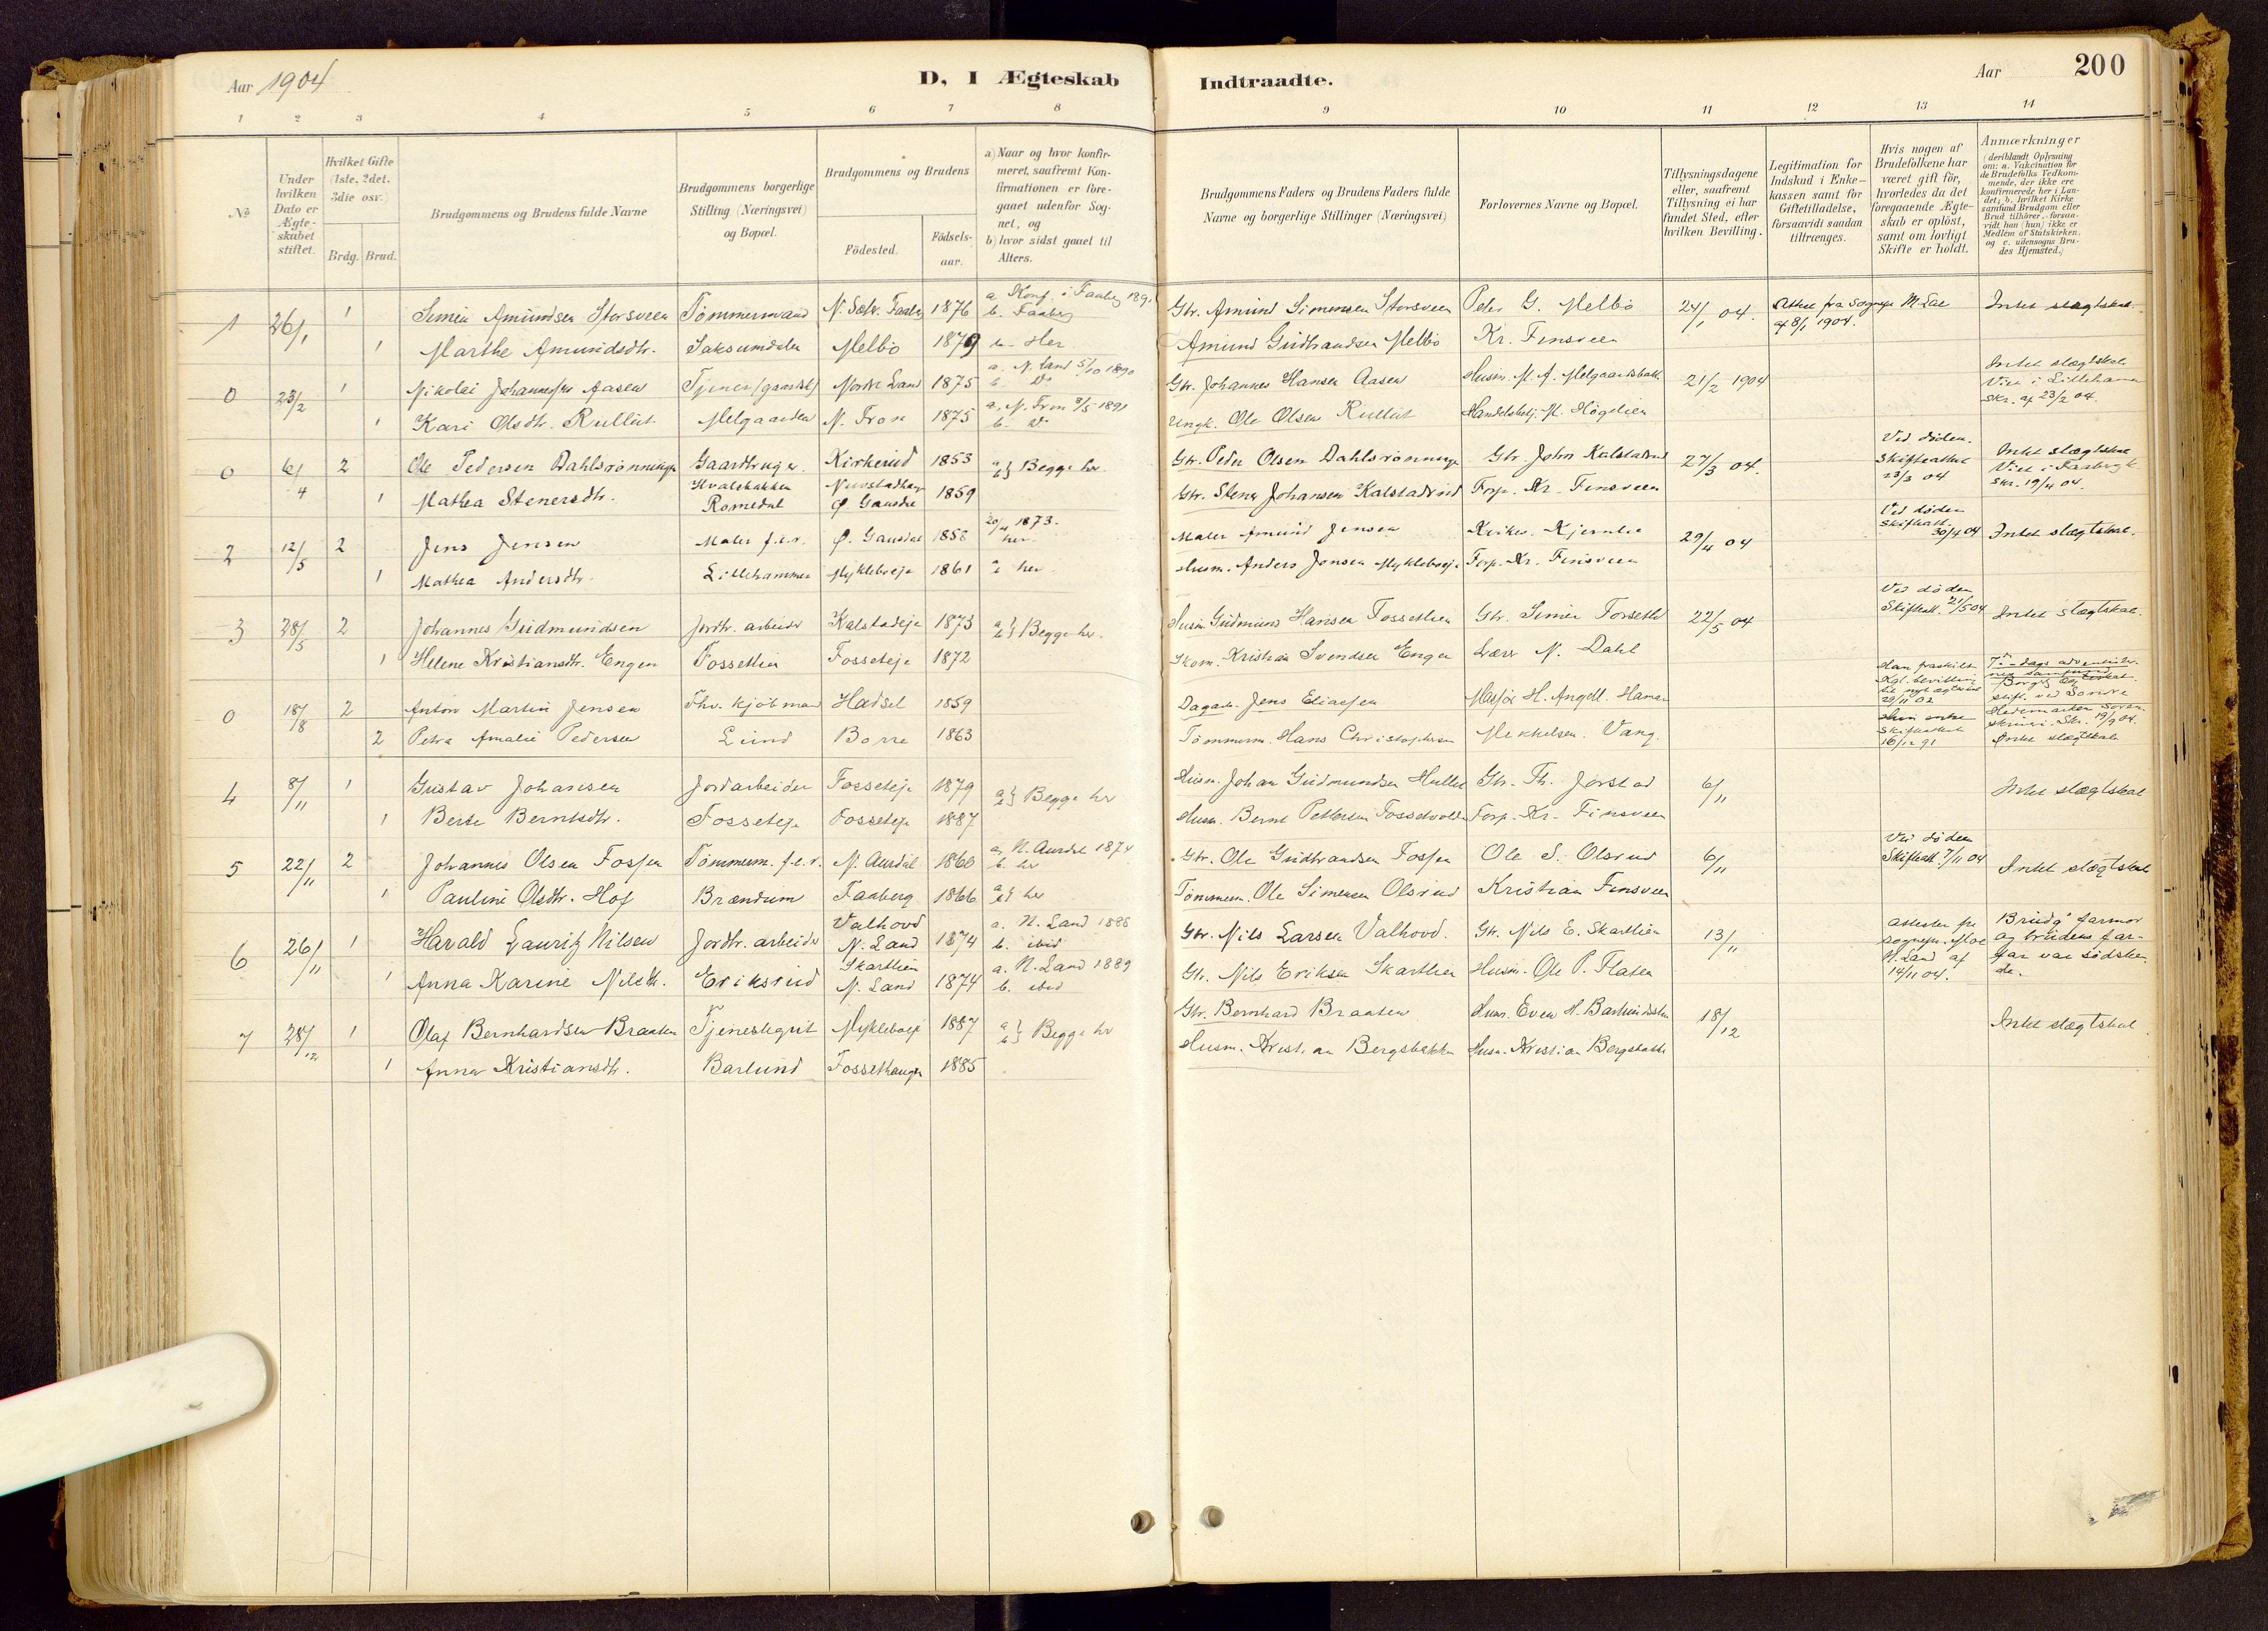 SAH, Vestre Gausdal prestekontor, Ministerialbok nr. 1, 1887-1914, s. 200